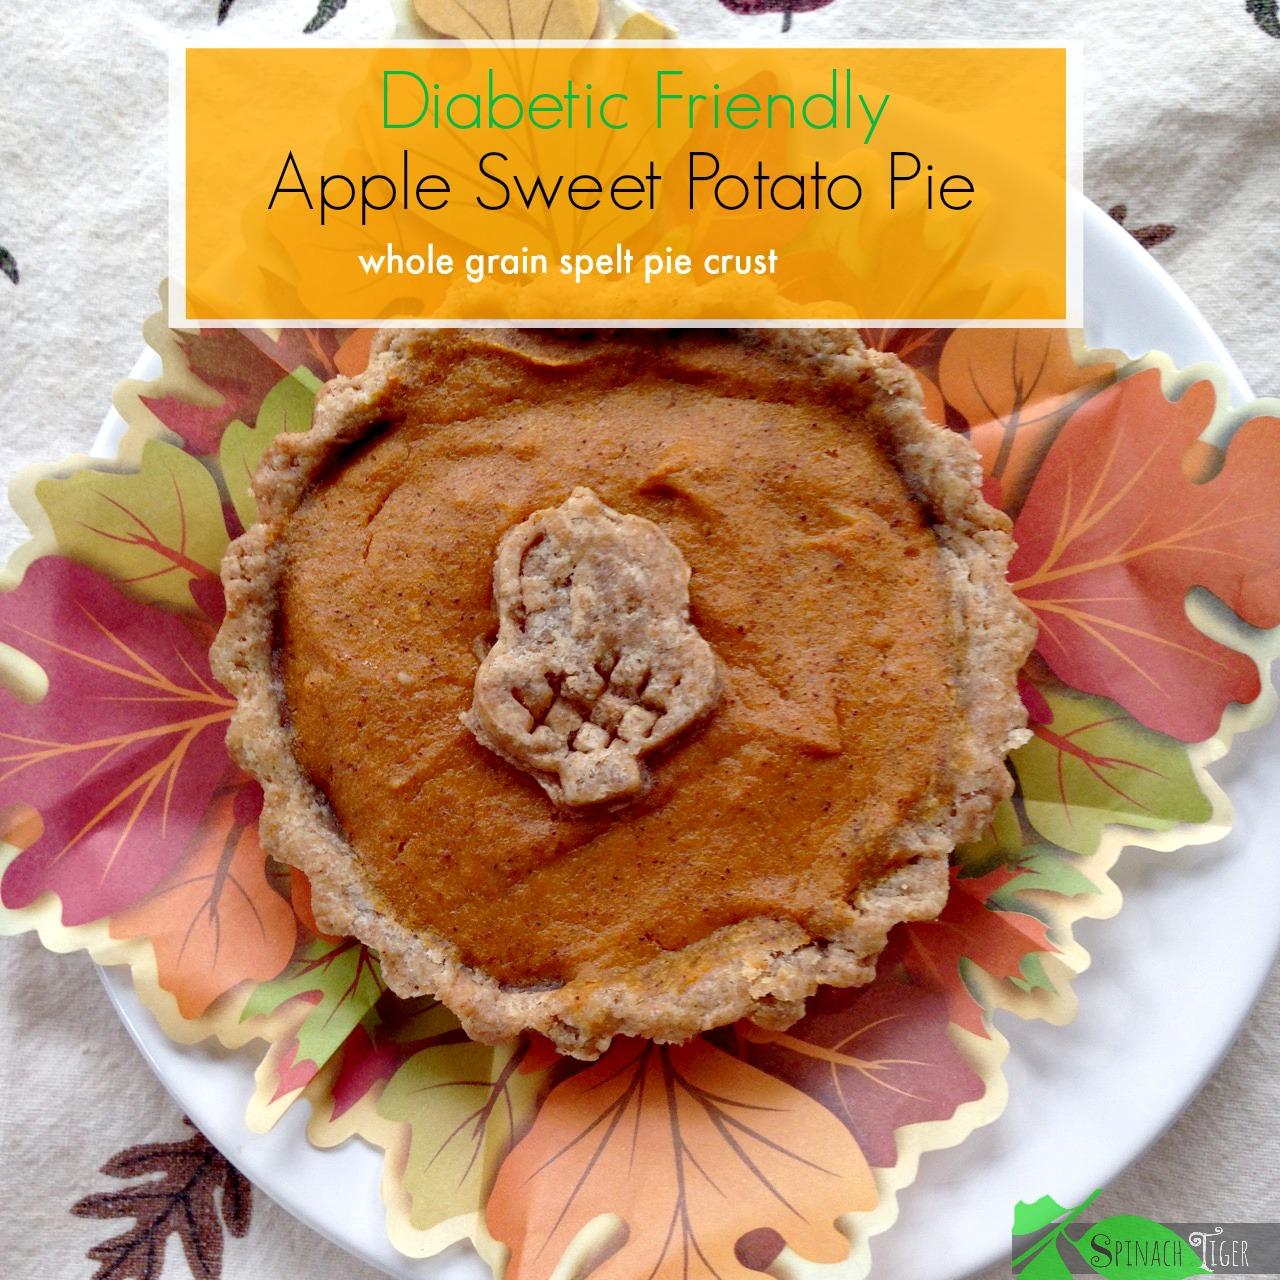 Apple Sweet Potato Pie with Spelt Crust